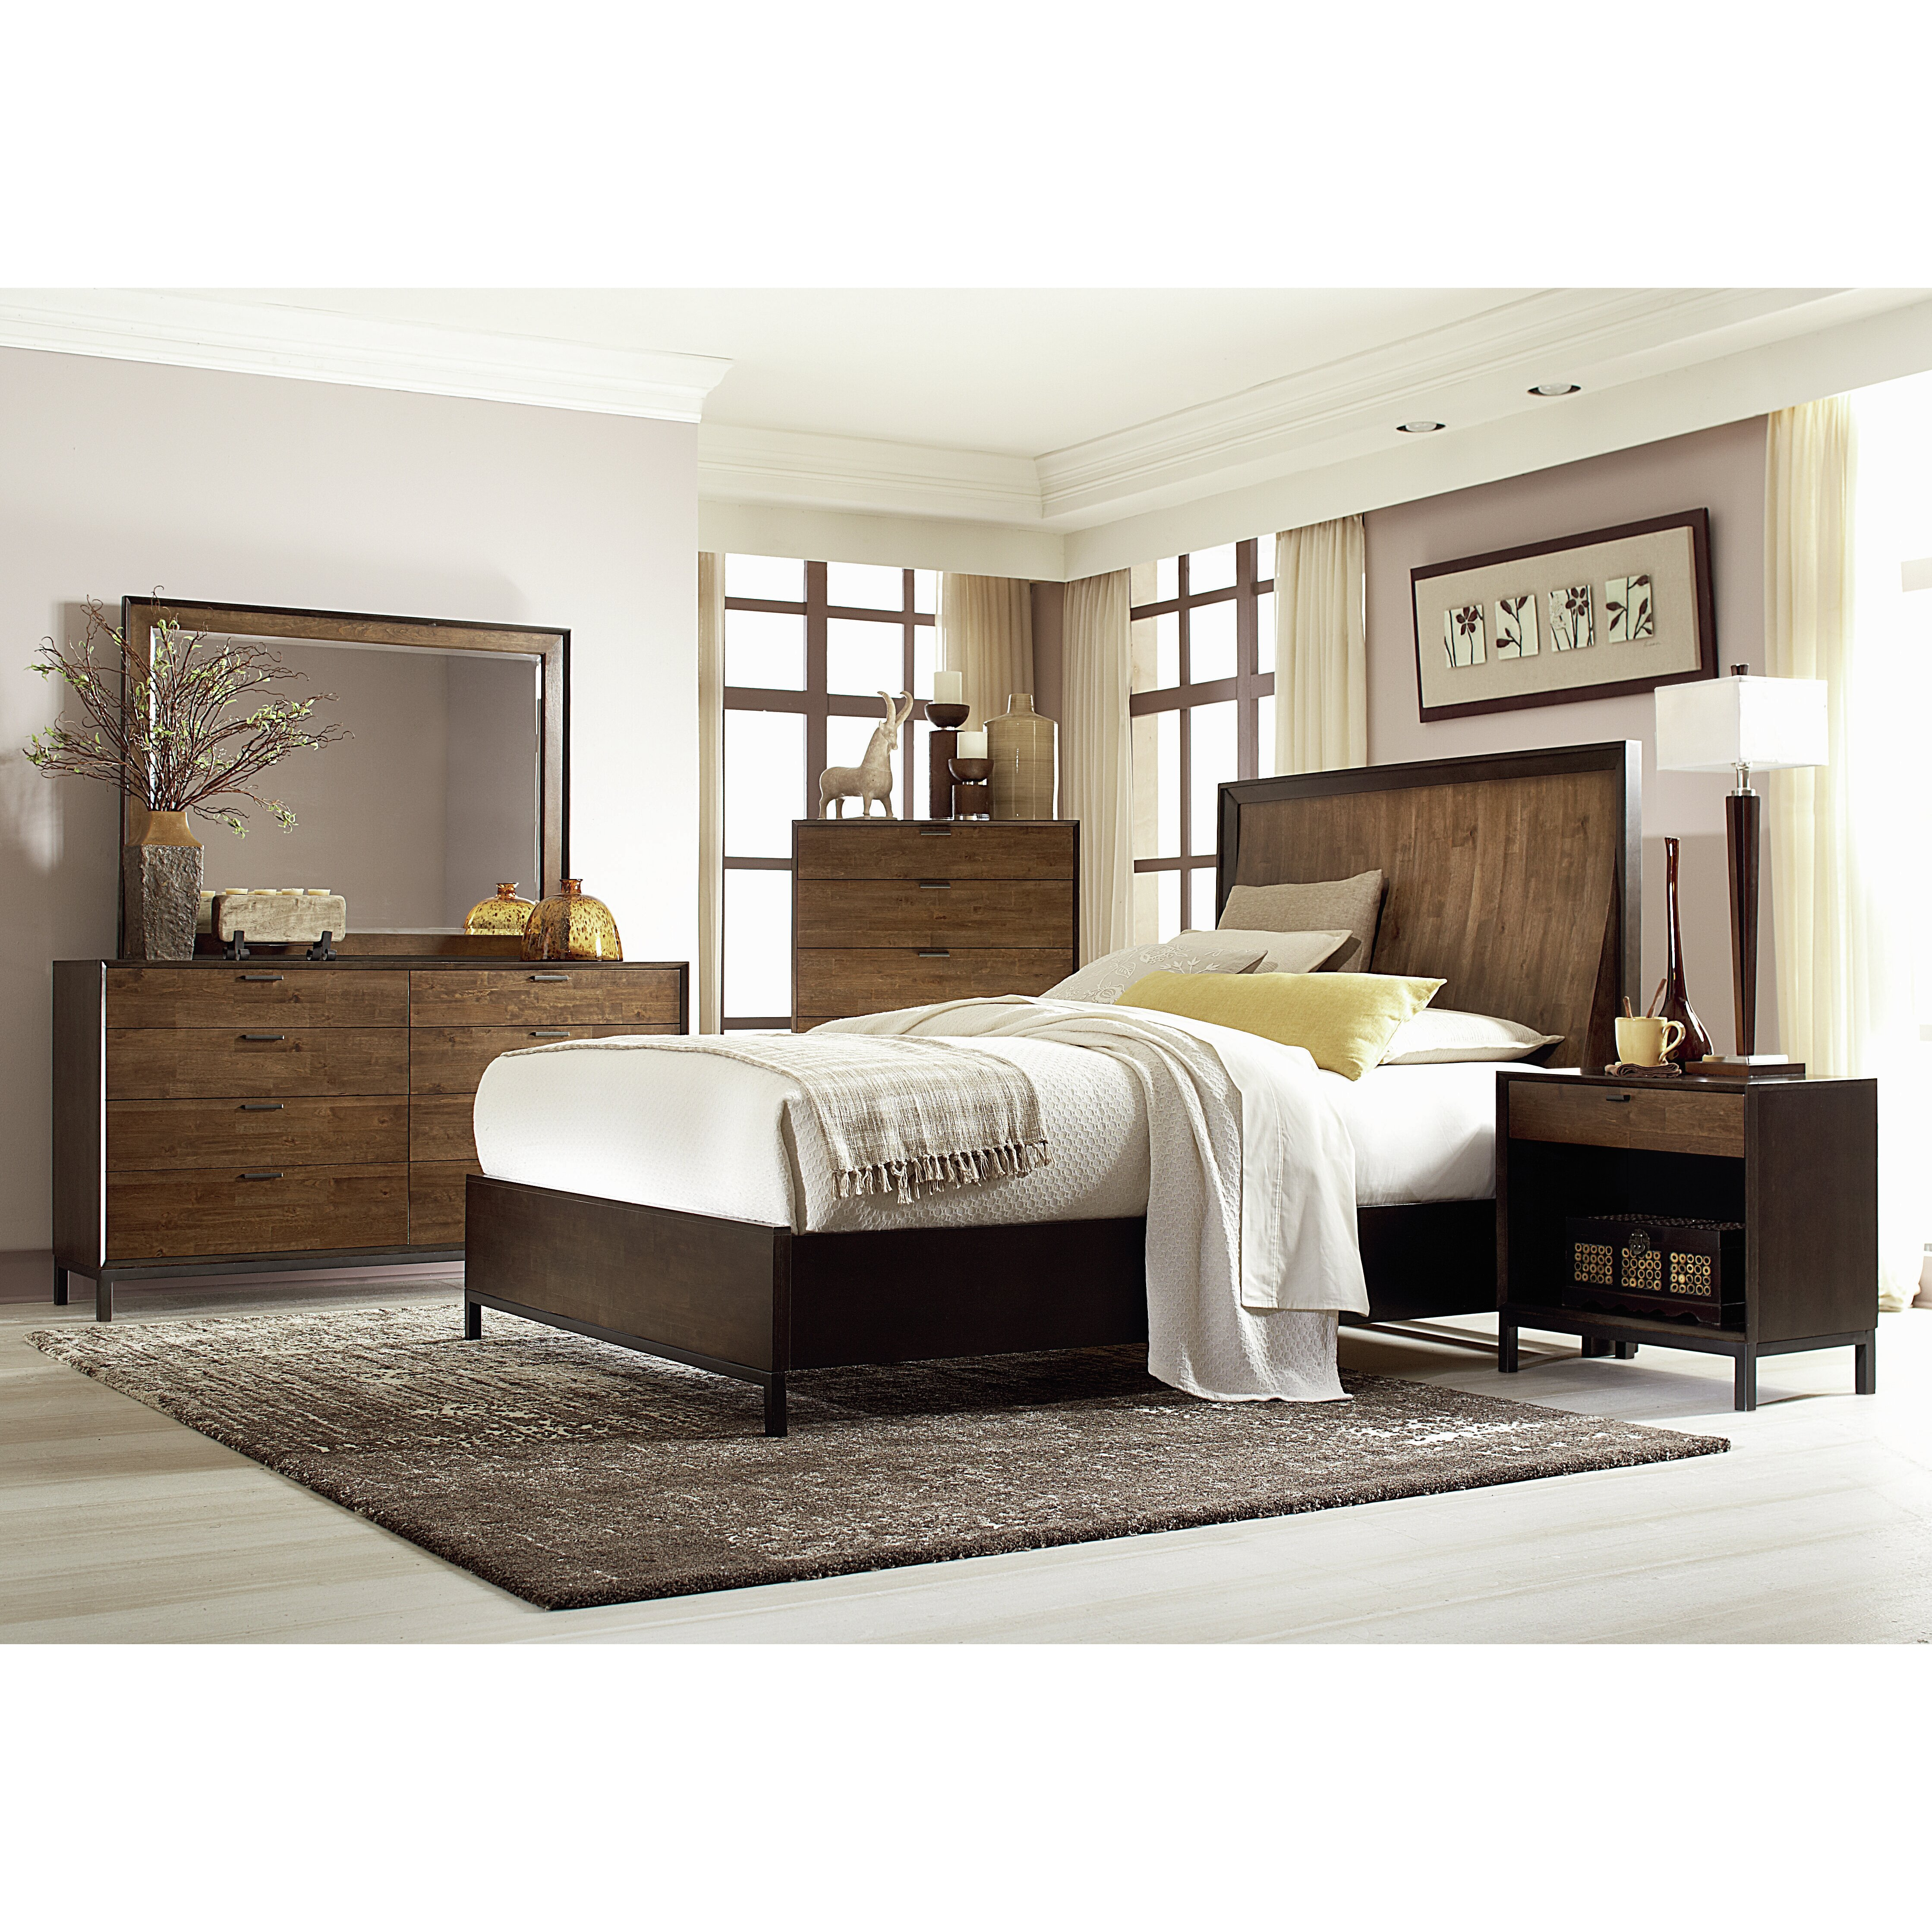 Legacy Bedroom Furniture Legacy Classic Furniture Kateri 5 Drawer Chest Reviews Wayfair